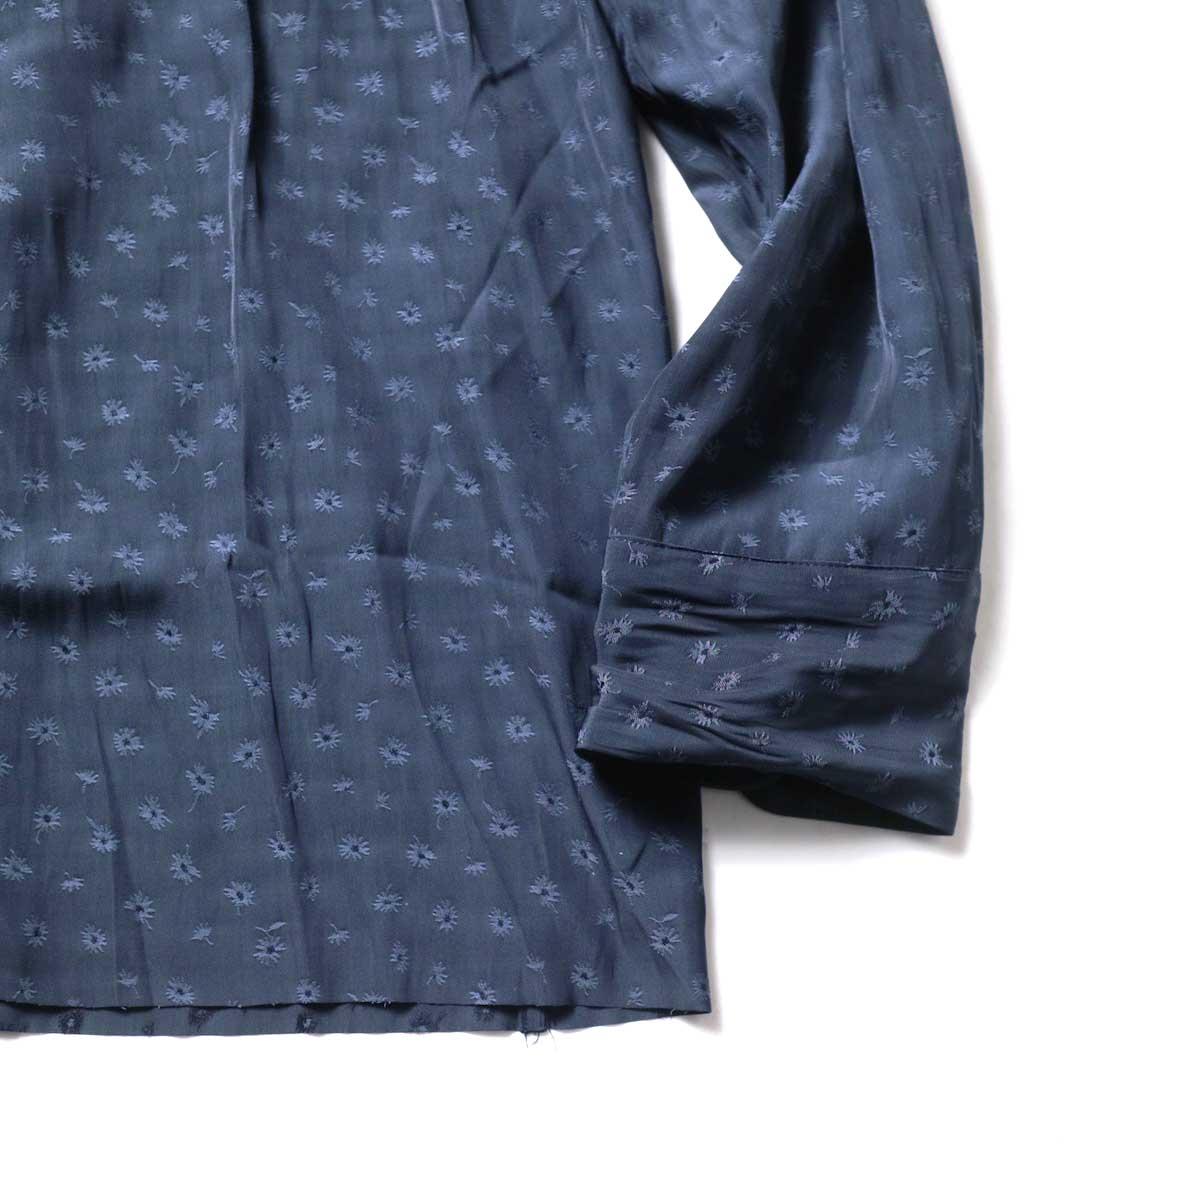 Needles / C.O.B. CLASSIC SHIRT - FLORET JQ. (Navy)袖、裾